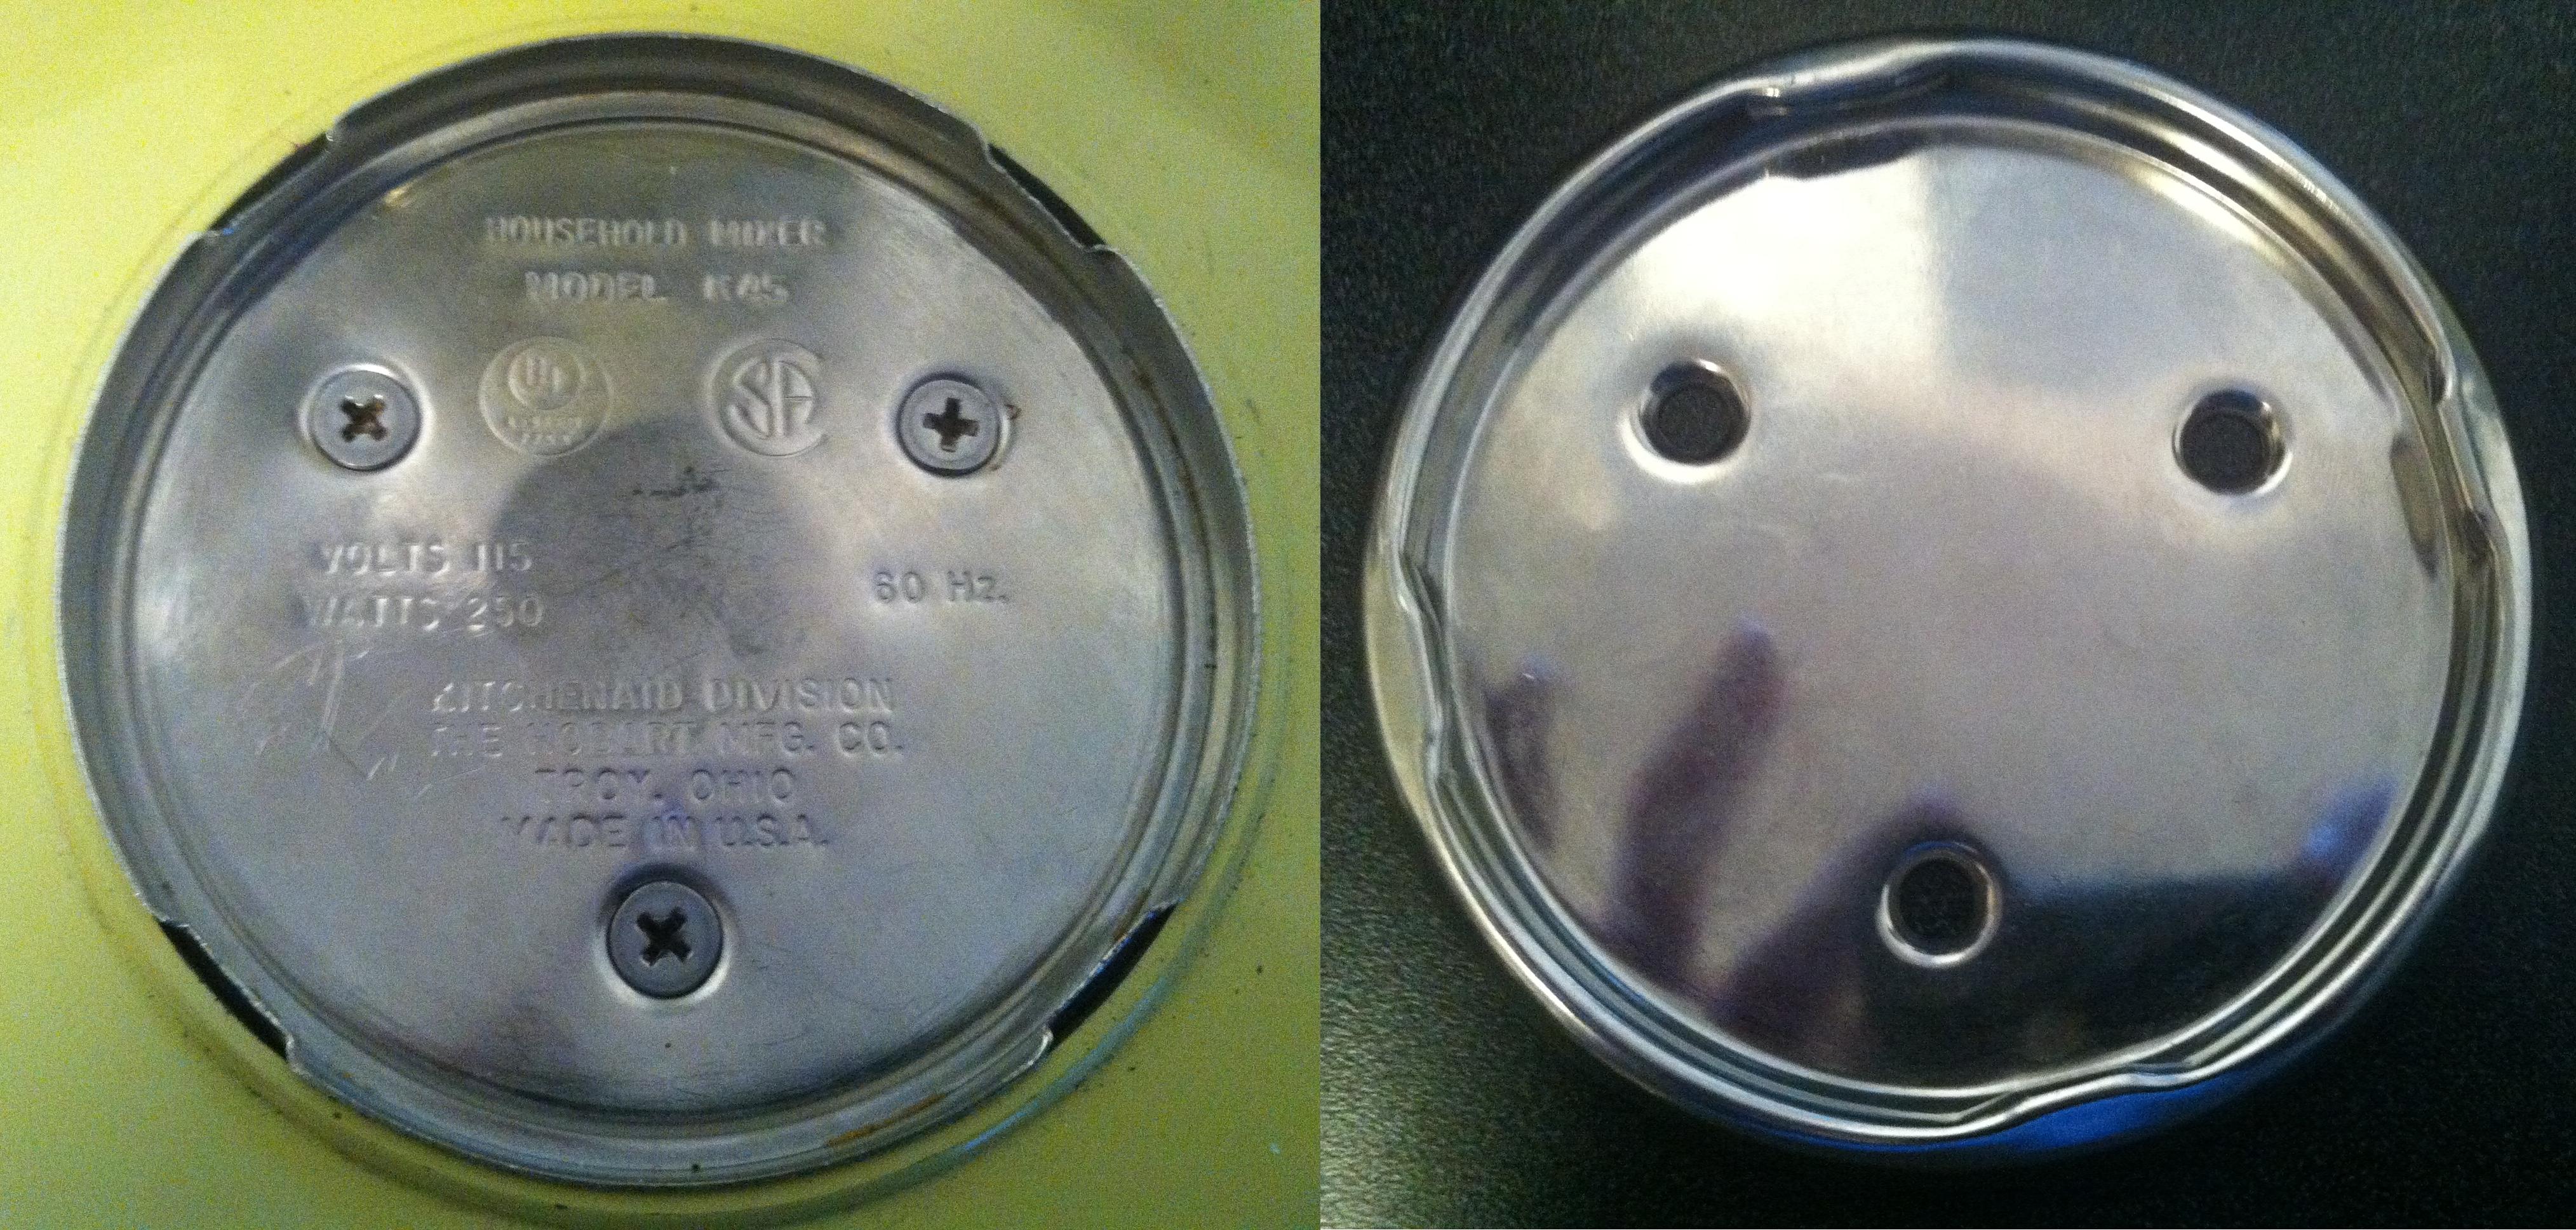 4162529 and 4163032 screw cap kits